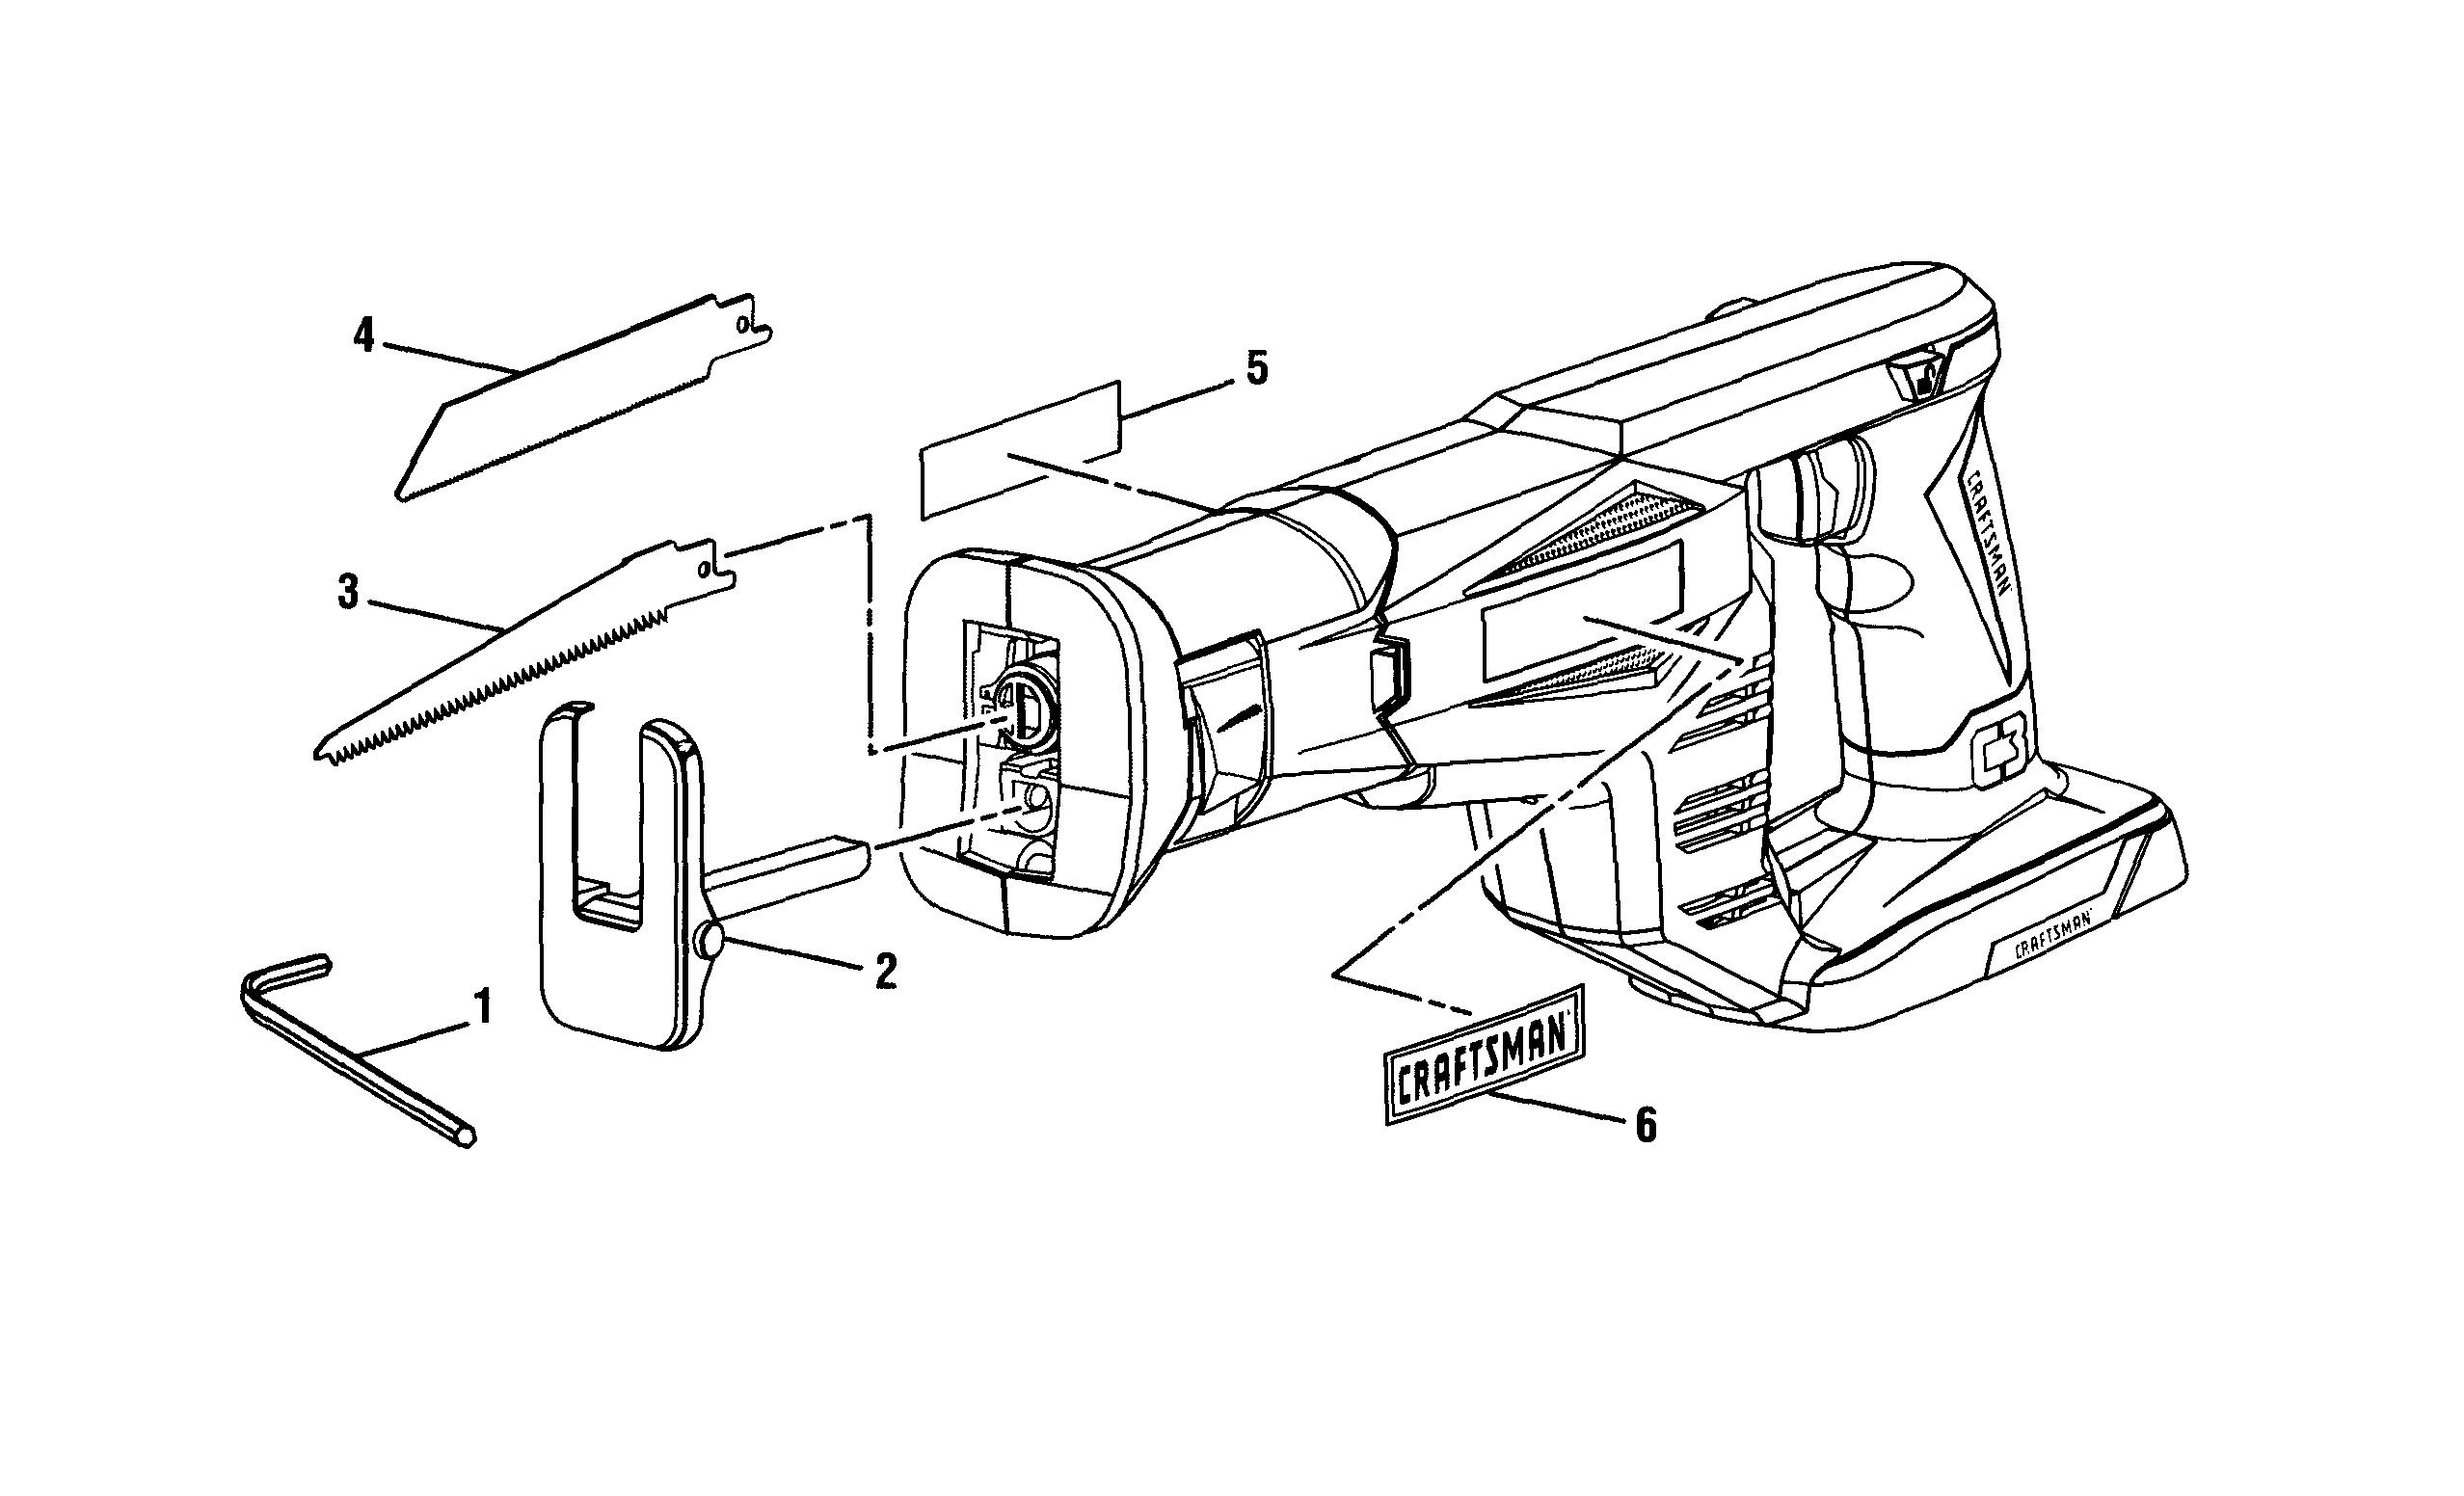 Craftsman model 315CRS1000 saw reciprocating genuine parts